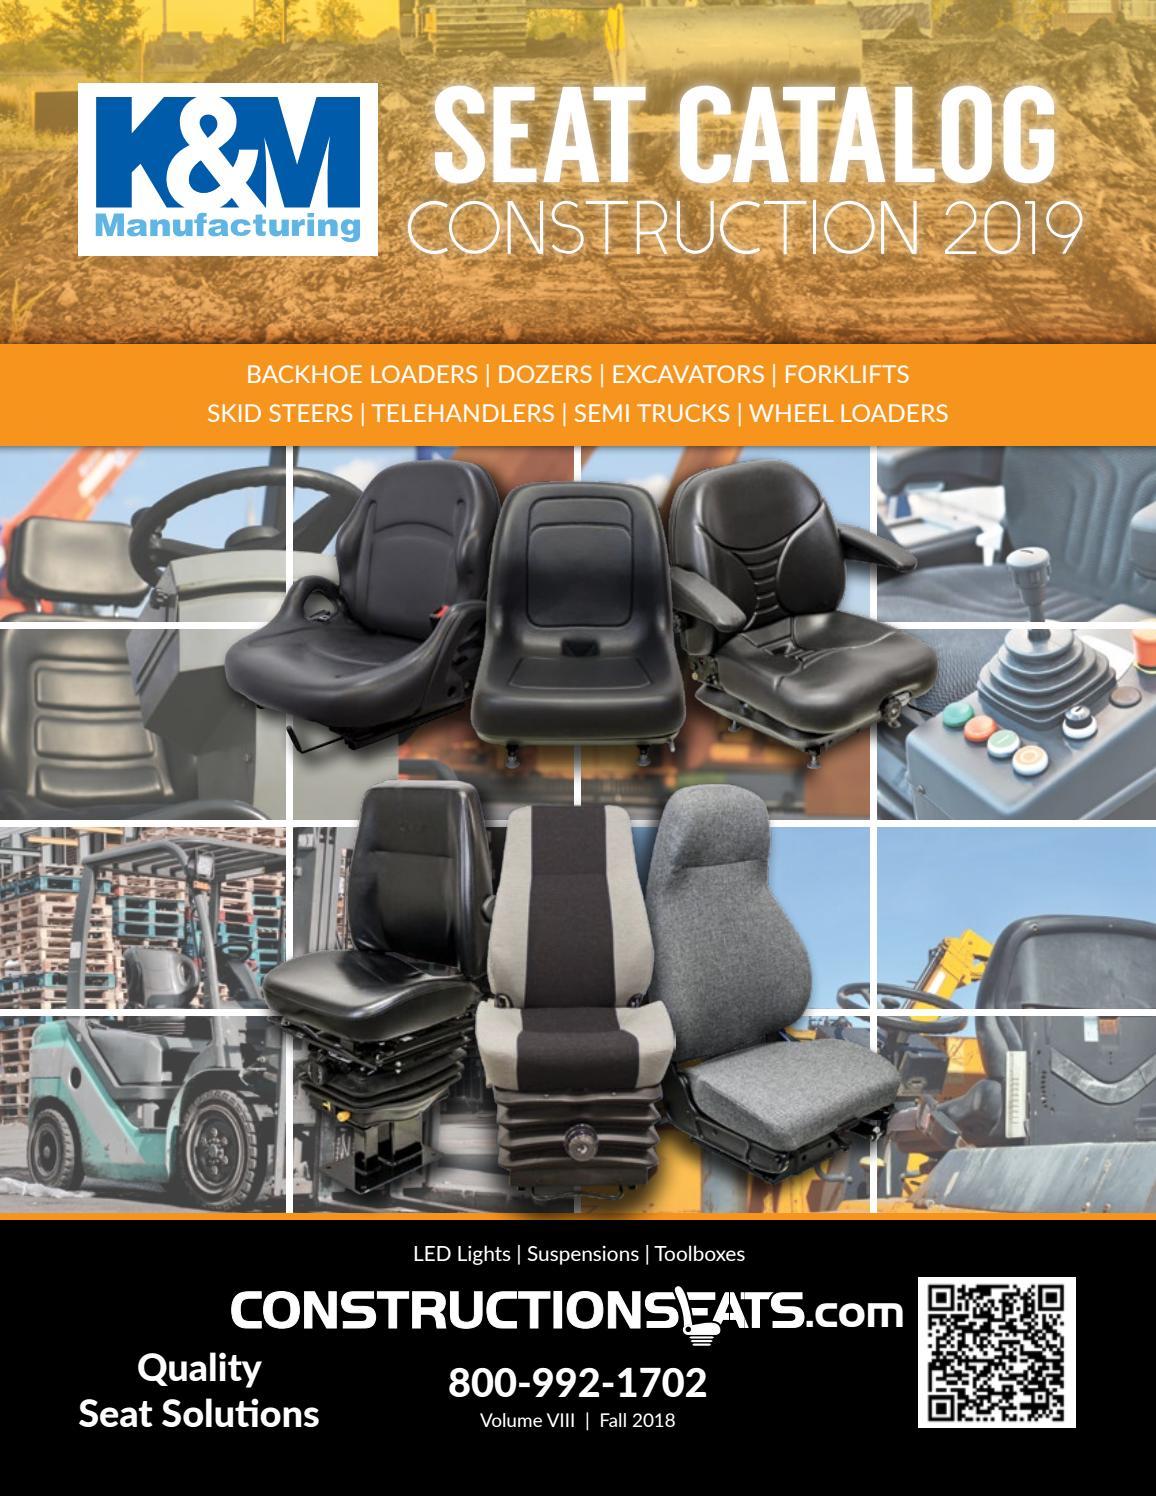 2019 K&M Construction Catalog by K&M - issuu